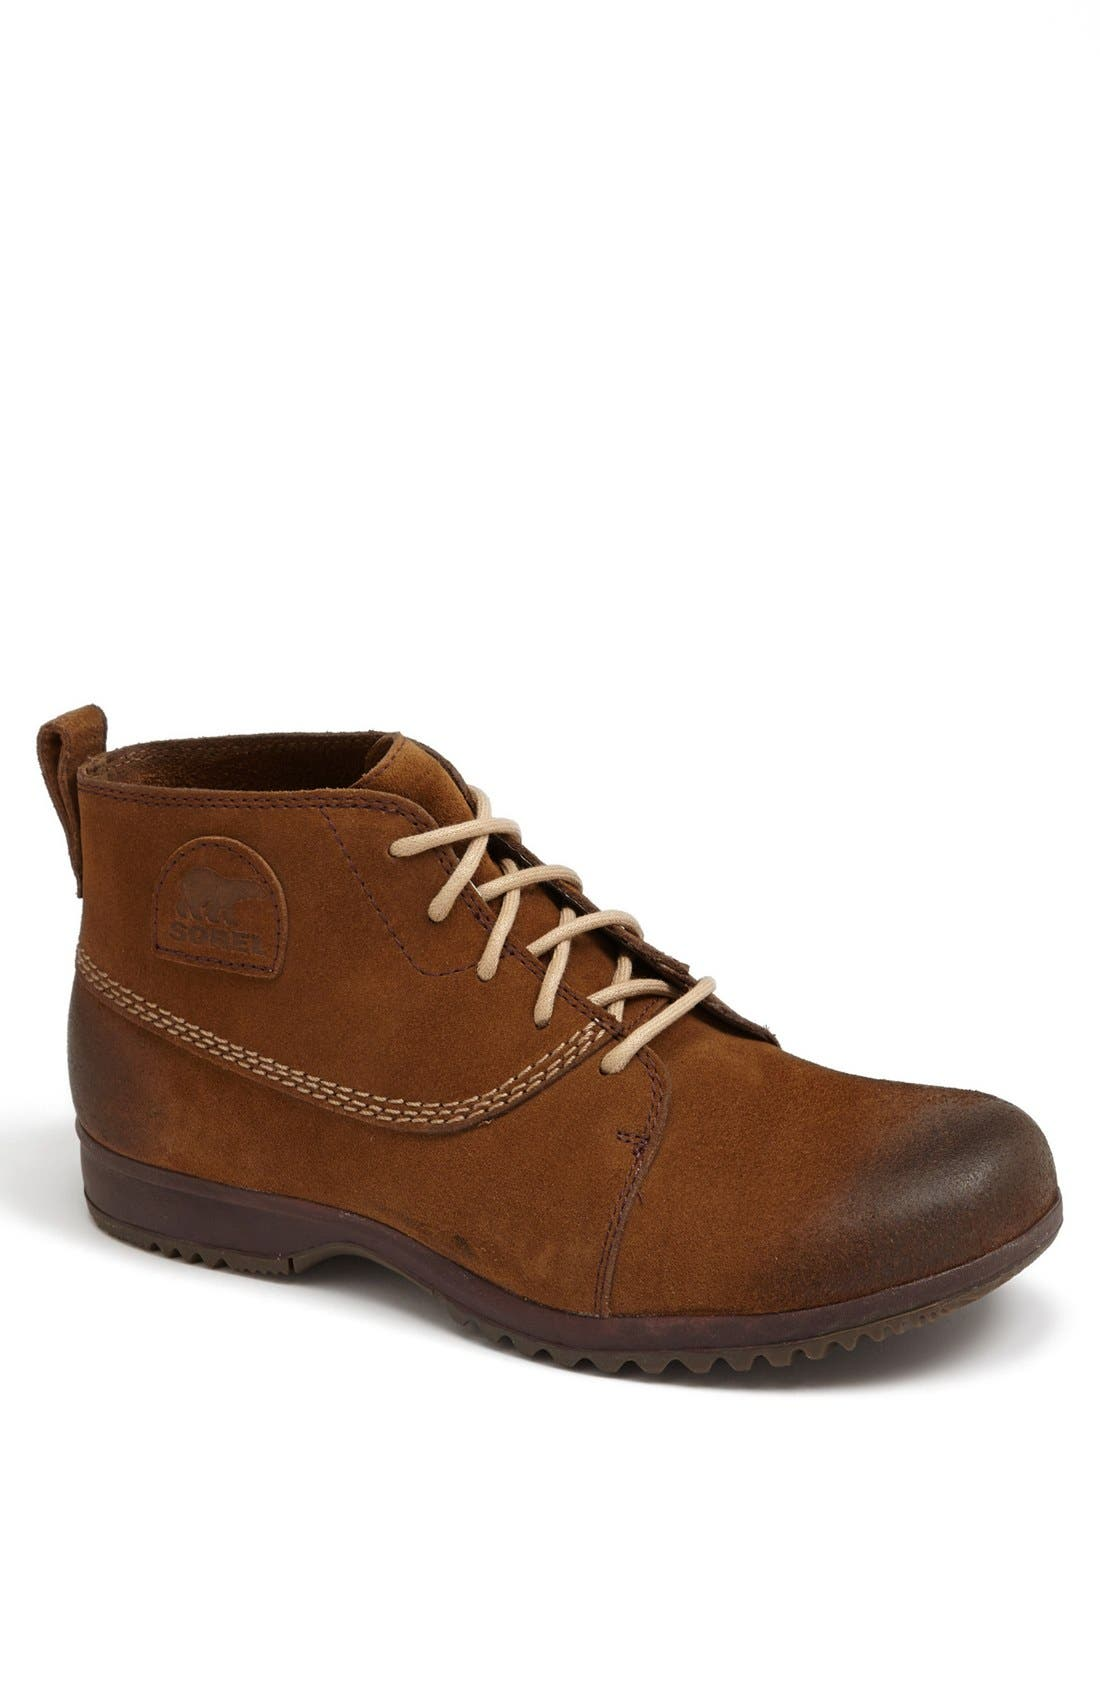 Main Image - SOREL 'Greely' Boot